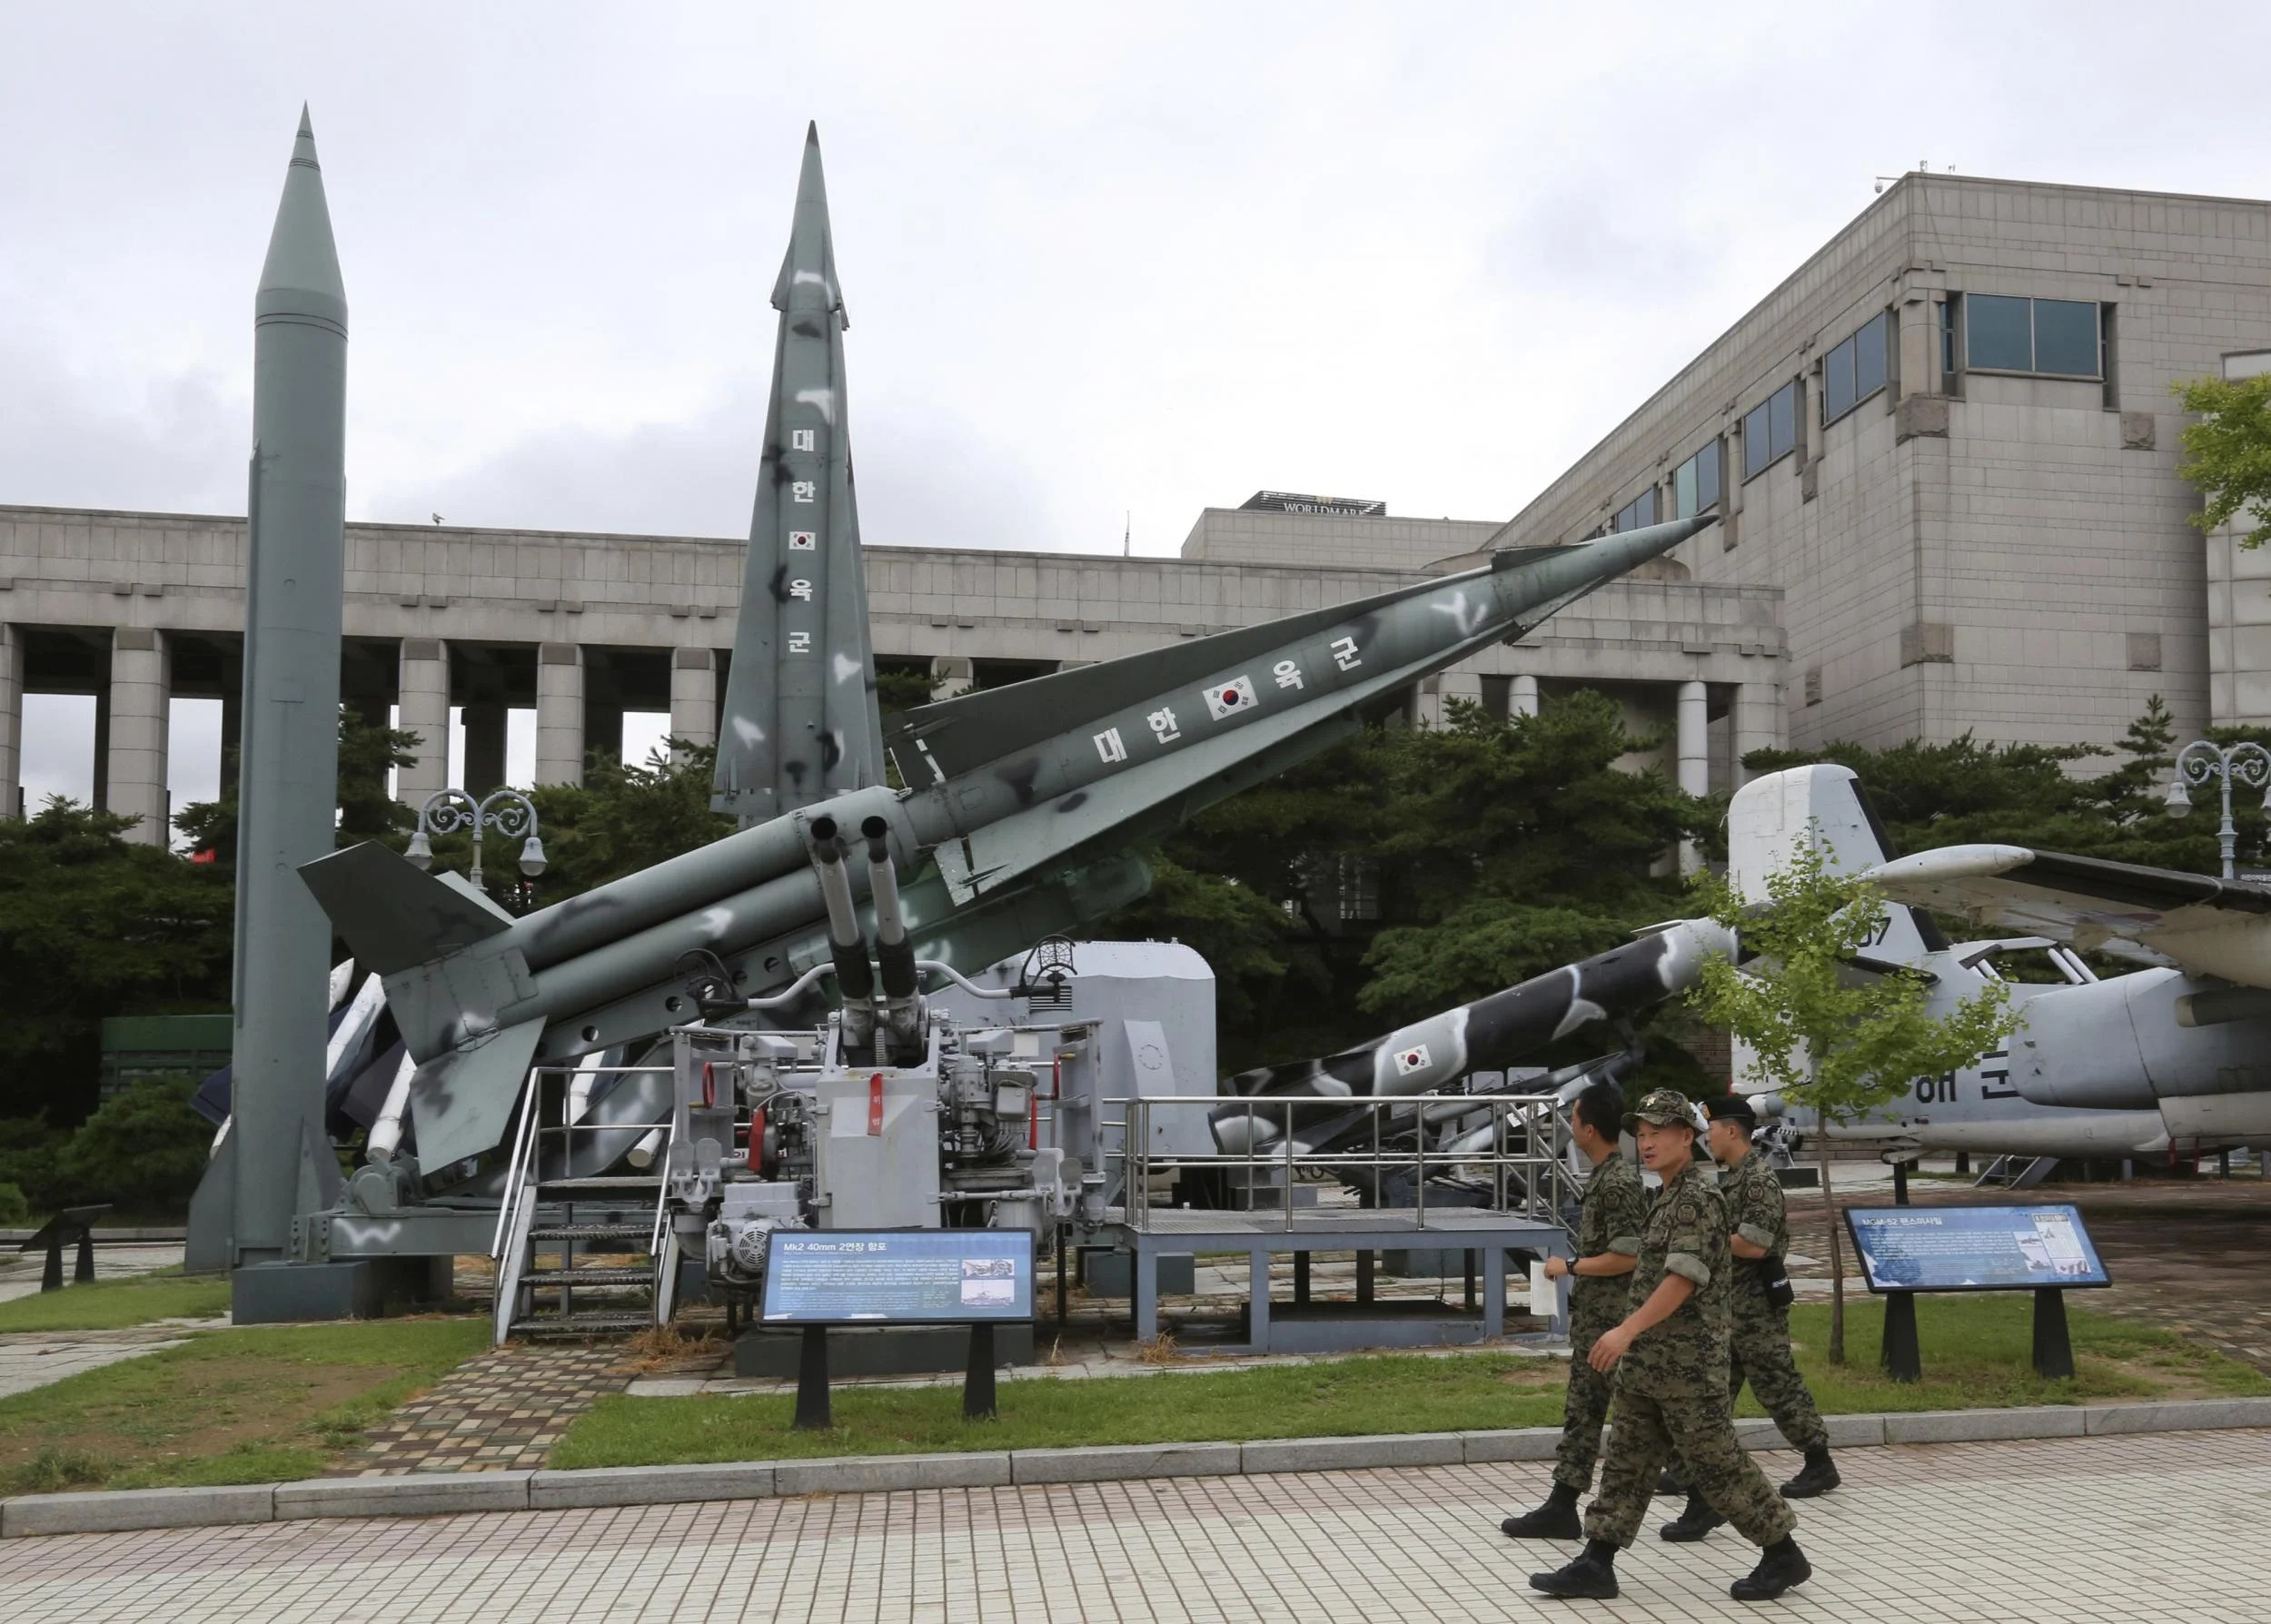 North Korea America Is Preparing Military Options In Case Sanctions Fail Says Most Senior Us